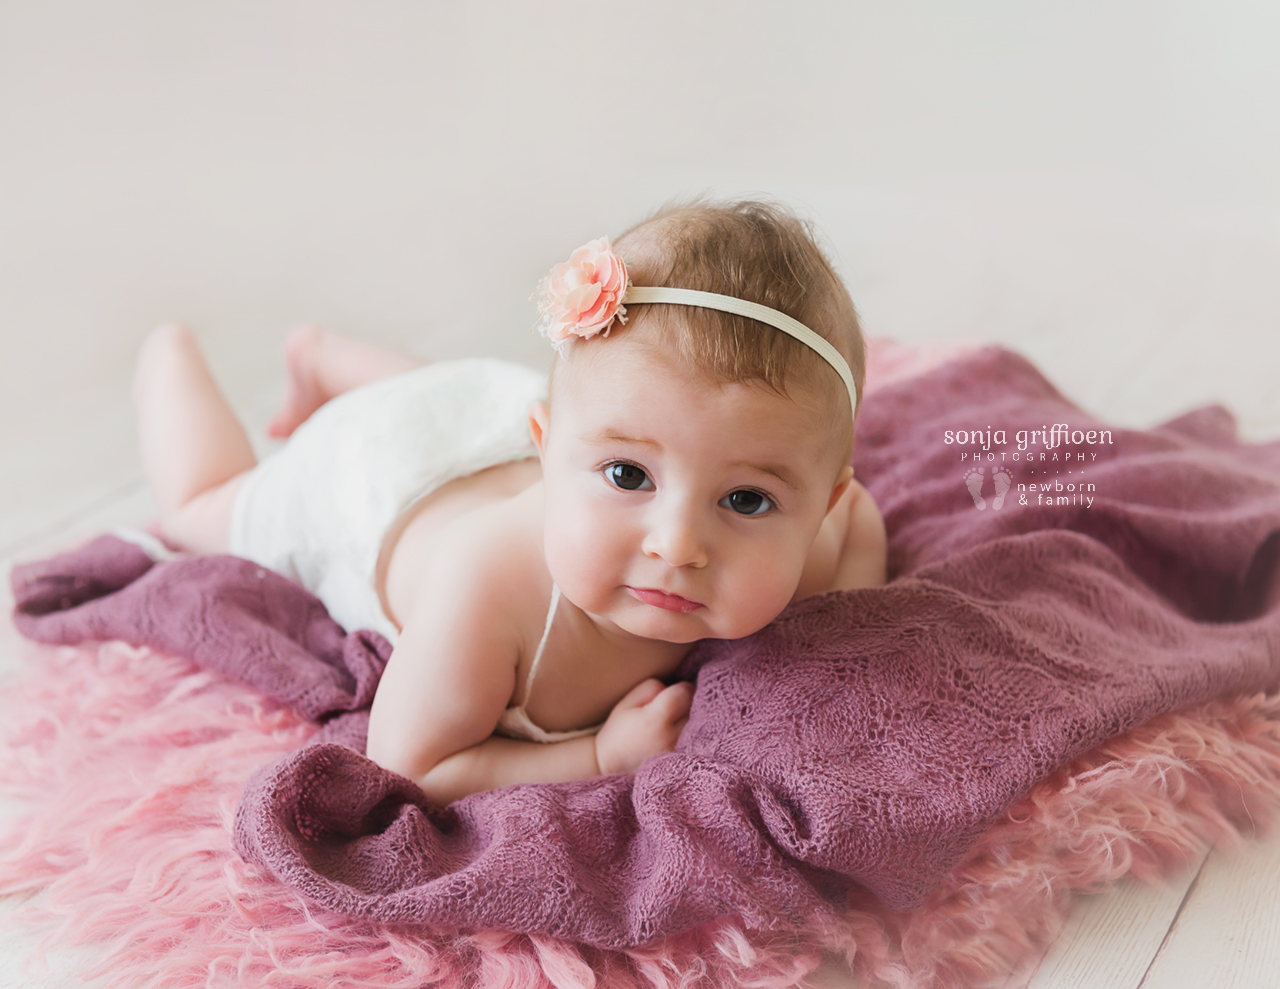 Everlyn-Milestone-Brisbane-Baby-Photography-Sonja-Griffioen-19.jpg